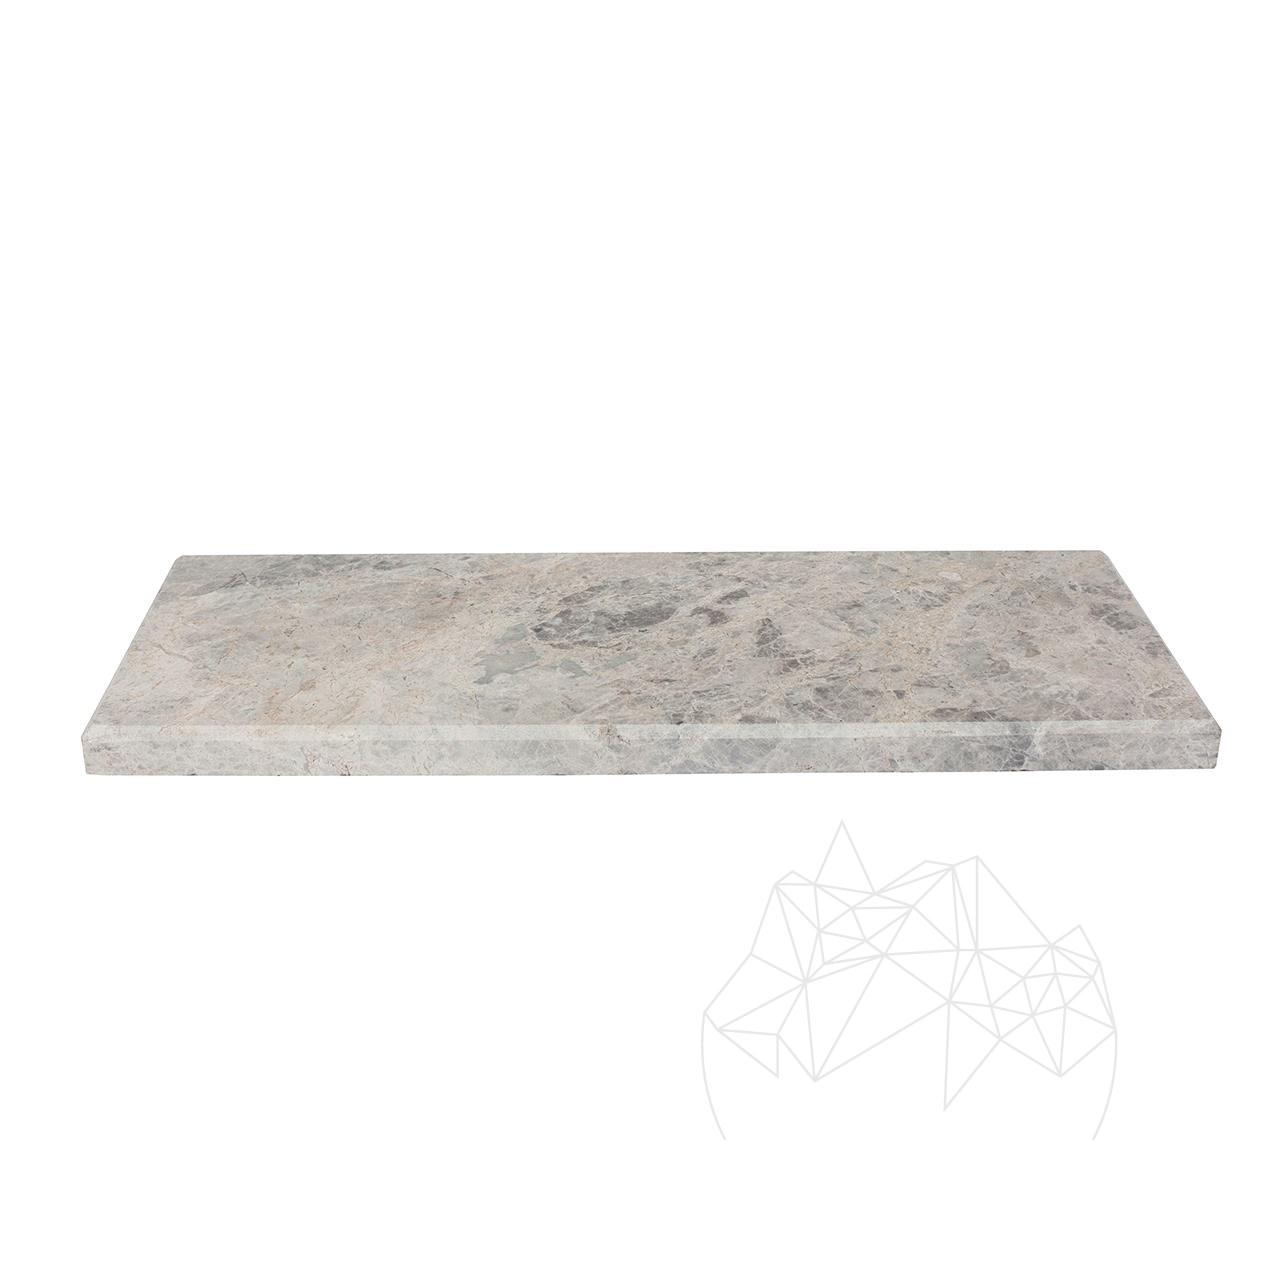 Tundra Grey Marble bathroom single shelf / shower shelves 40 x 14.5 x 2 cm